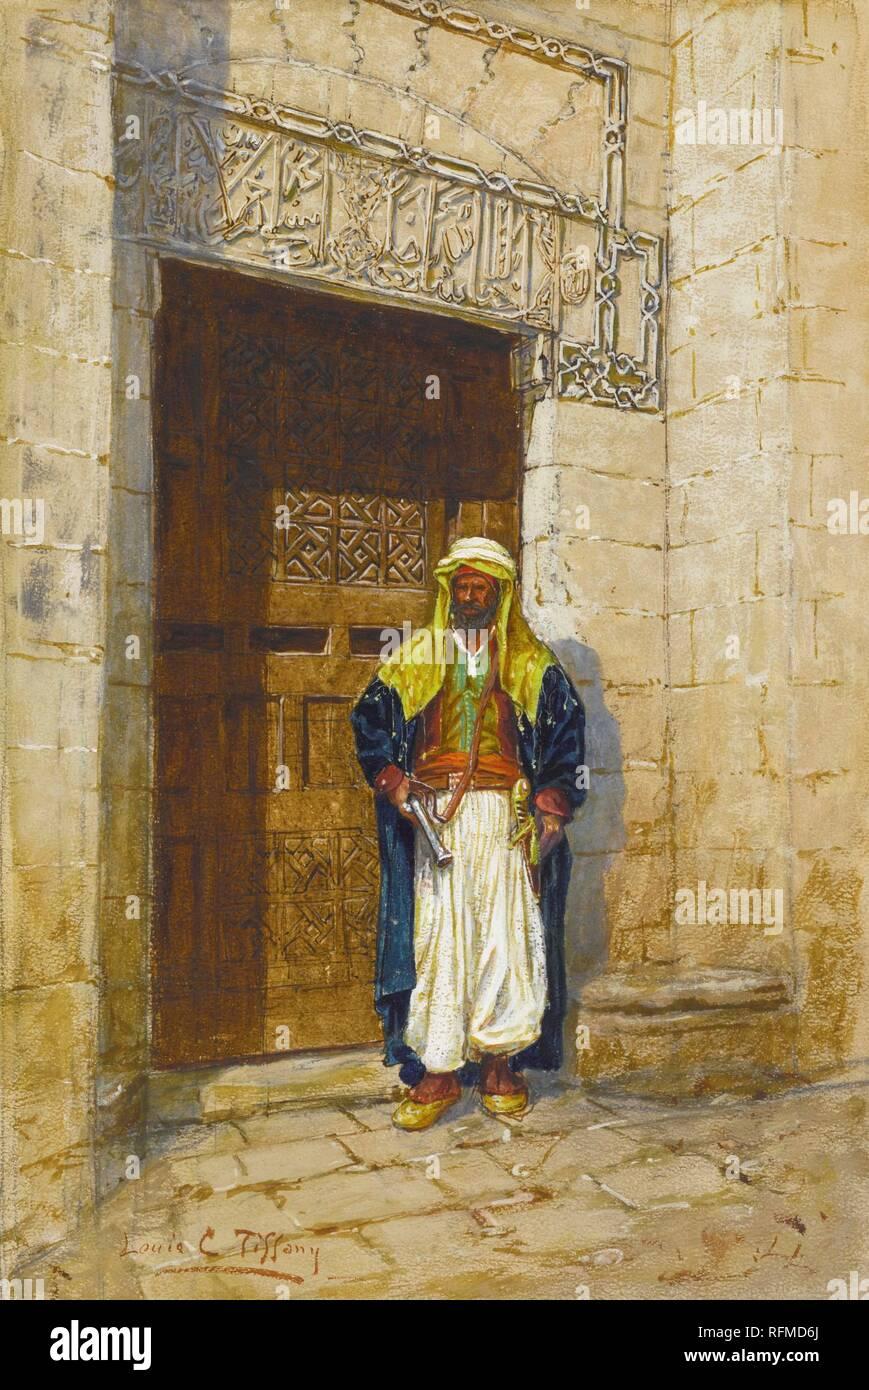 Louis Comfort Tiffany 1848 - 1933 ARABIAN SUBJECT.jpg - RFMD6J Stock Photo